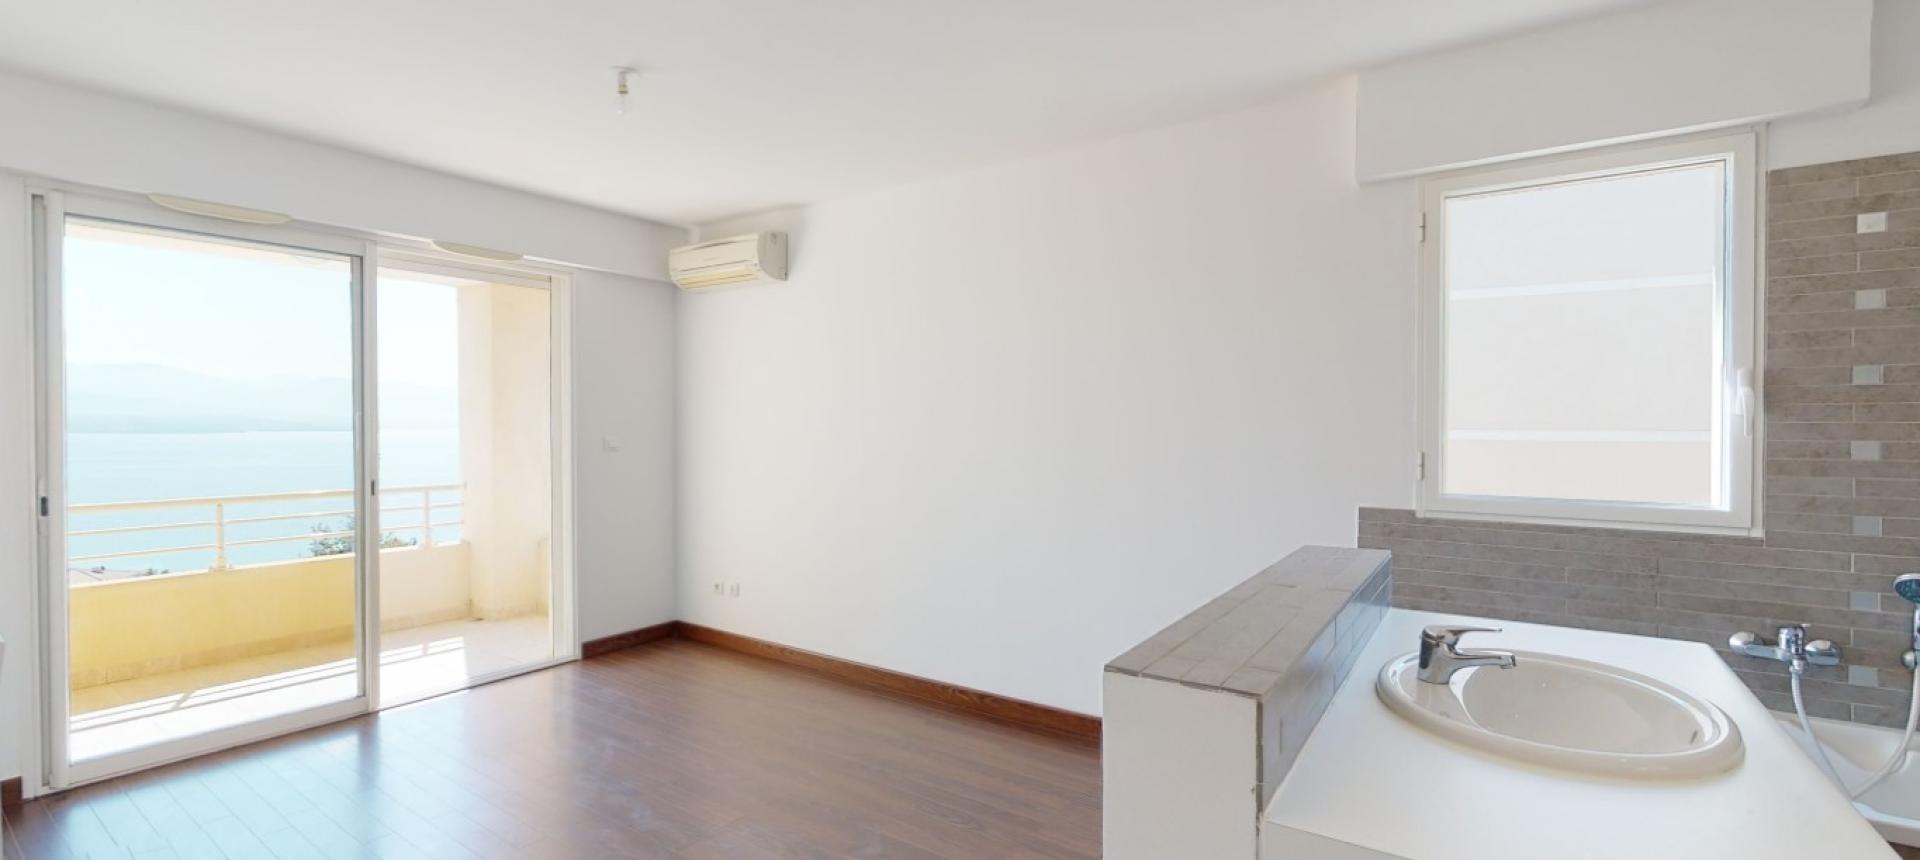 F5 à vendre vue mer Ajaccio master bedroom